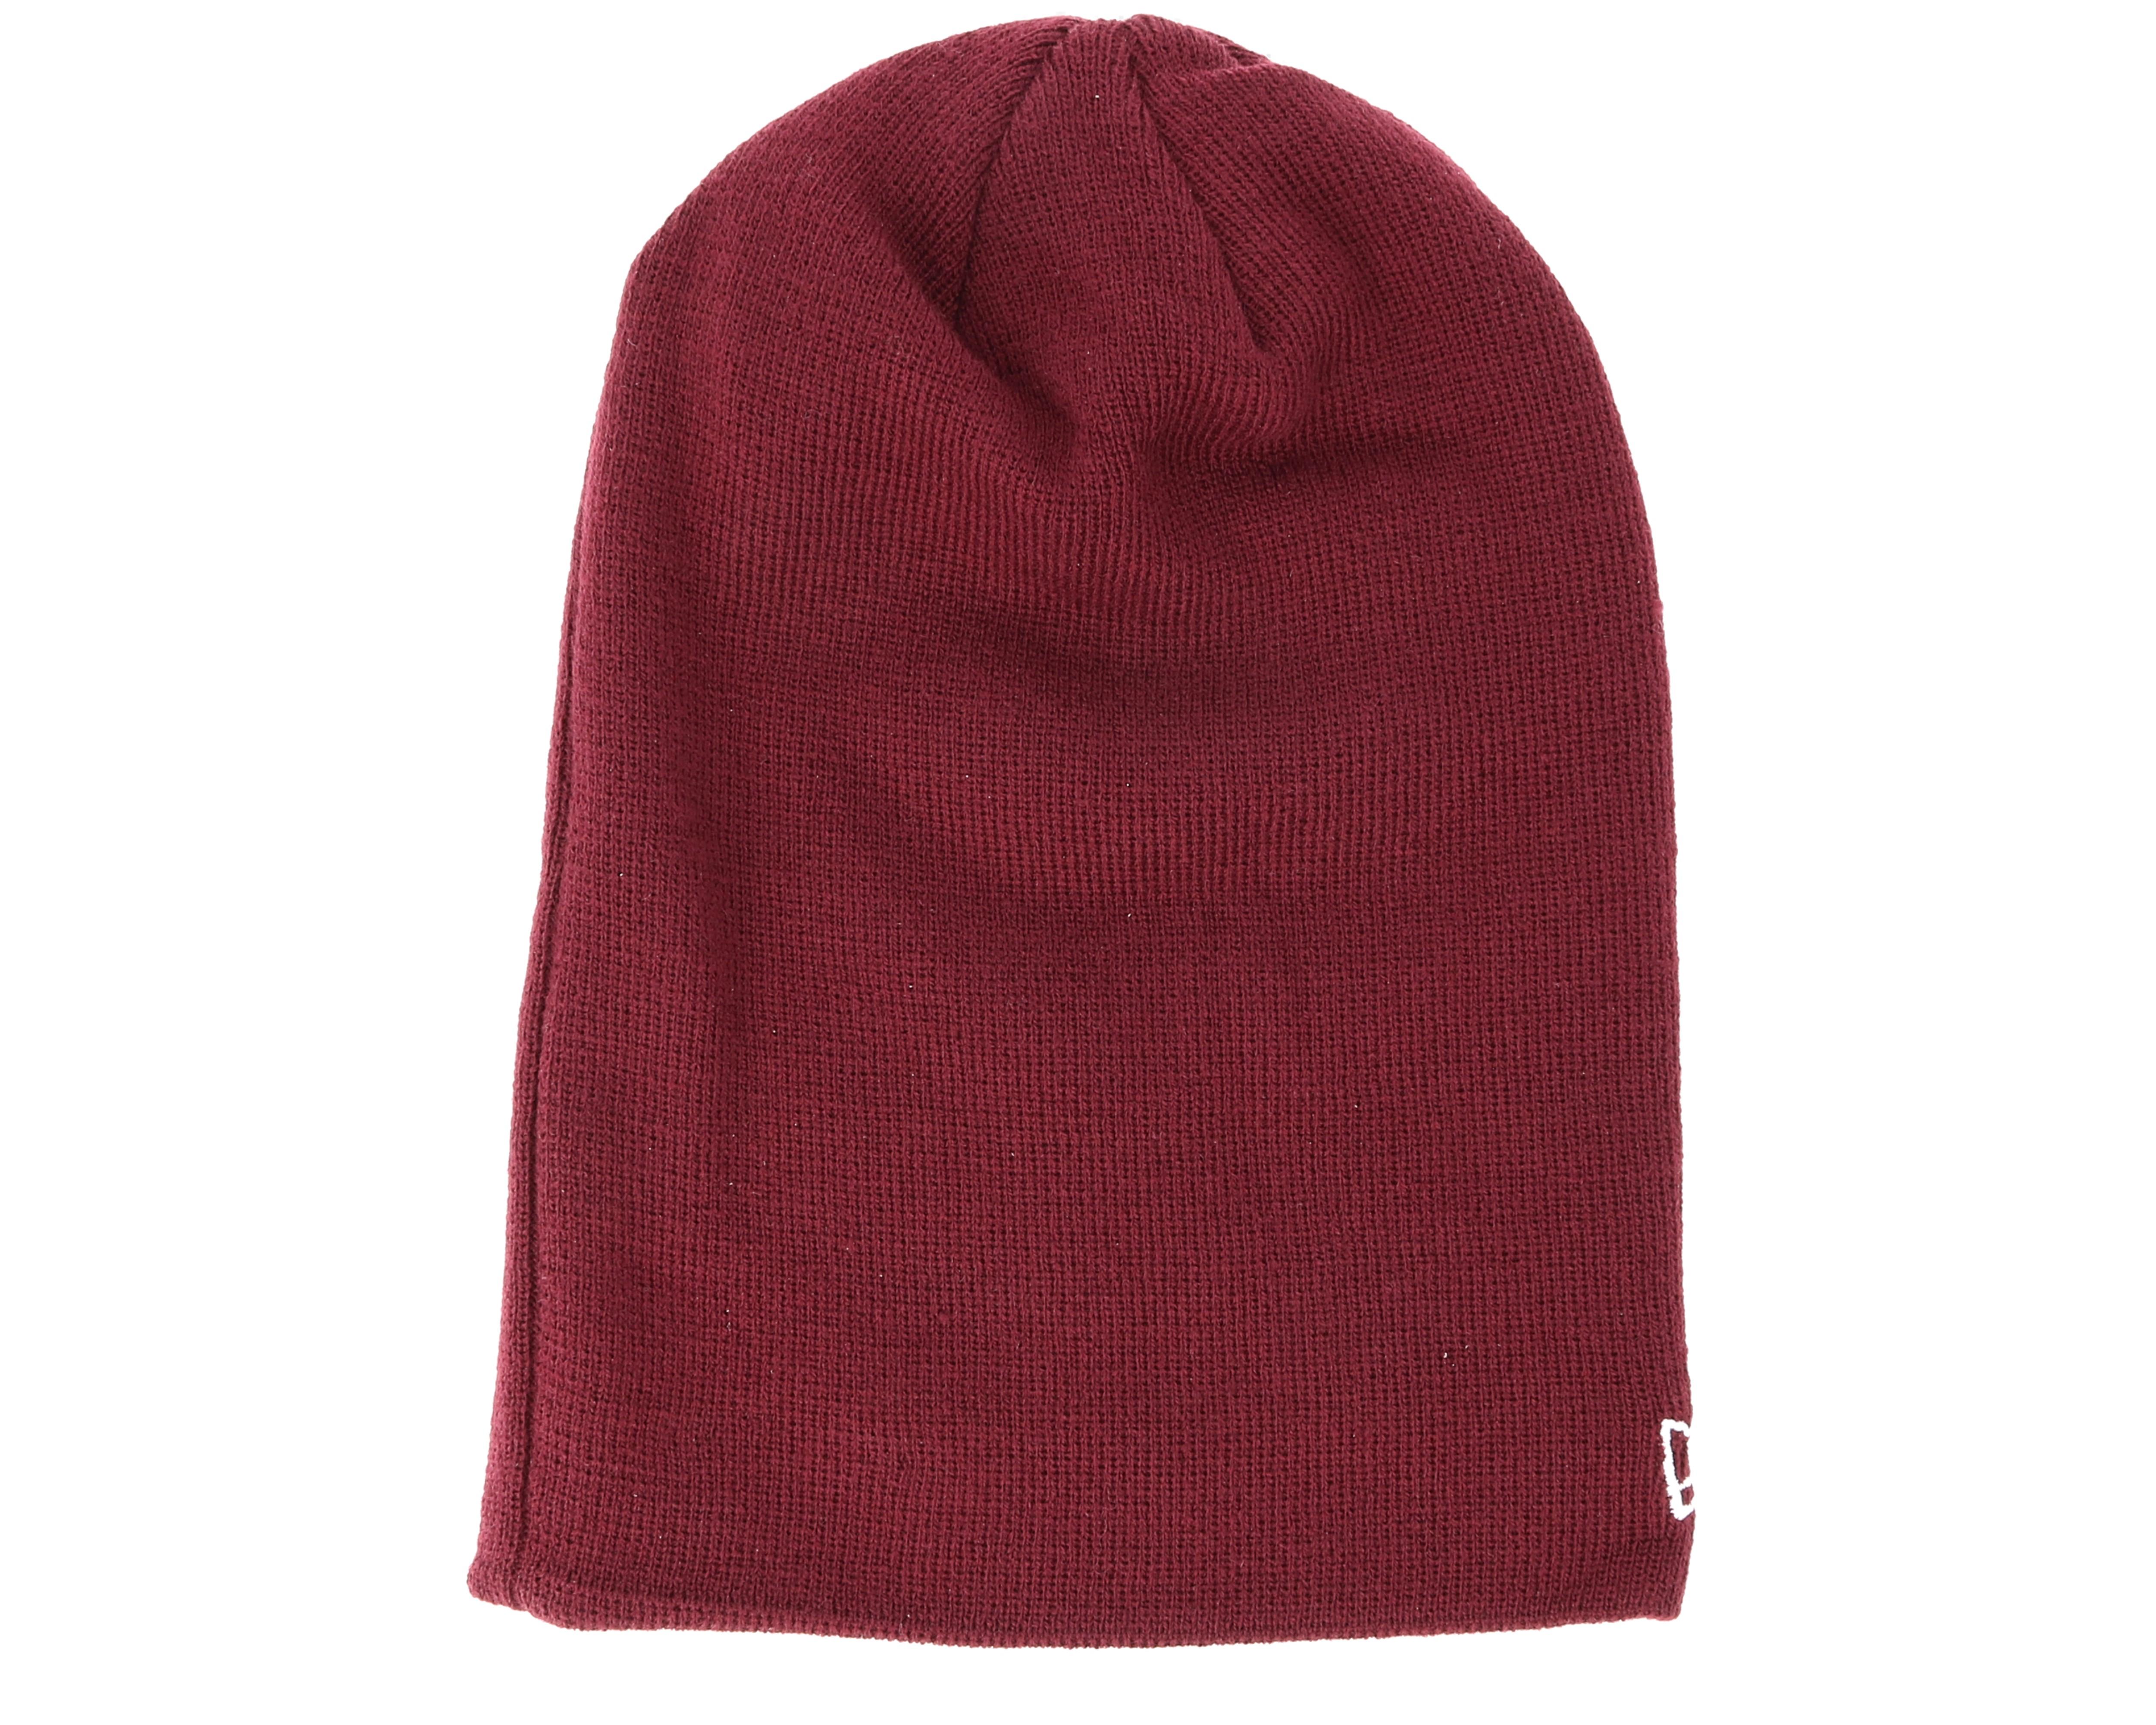 seasonal long knit maroon beanie new era beanies. Black Bedroom Furniture Sets. Home Design Ideas